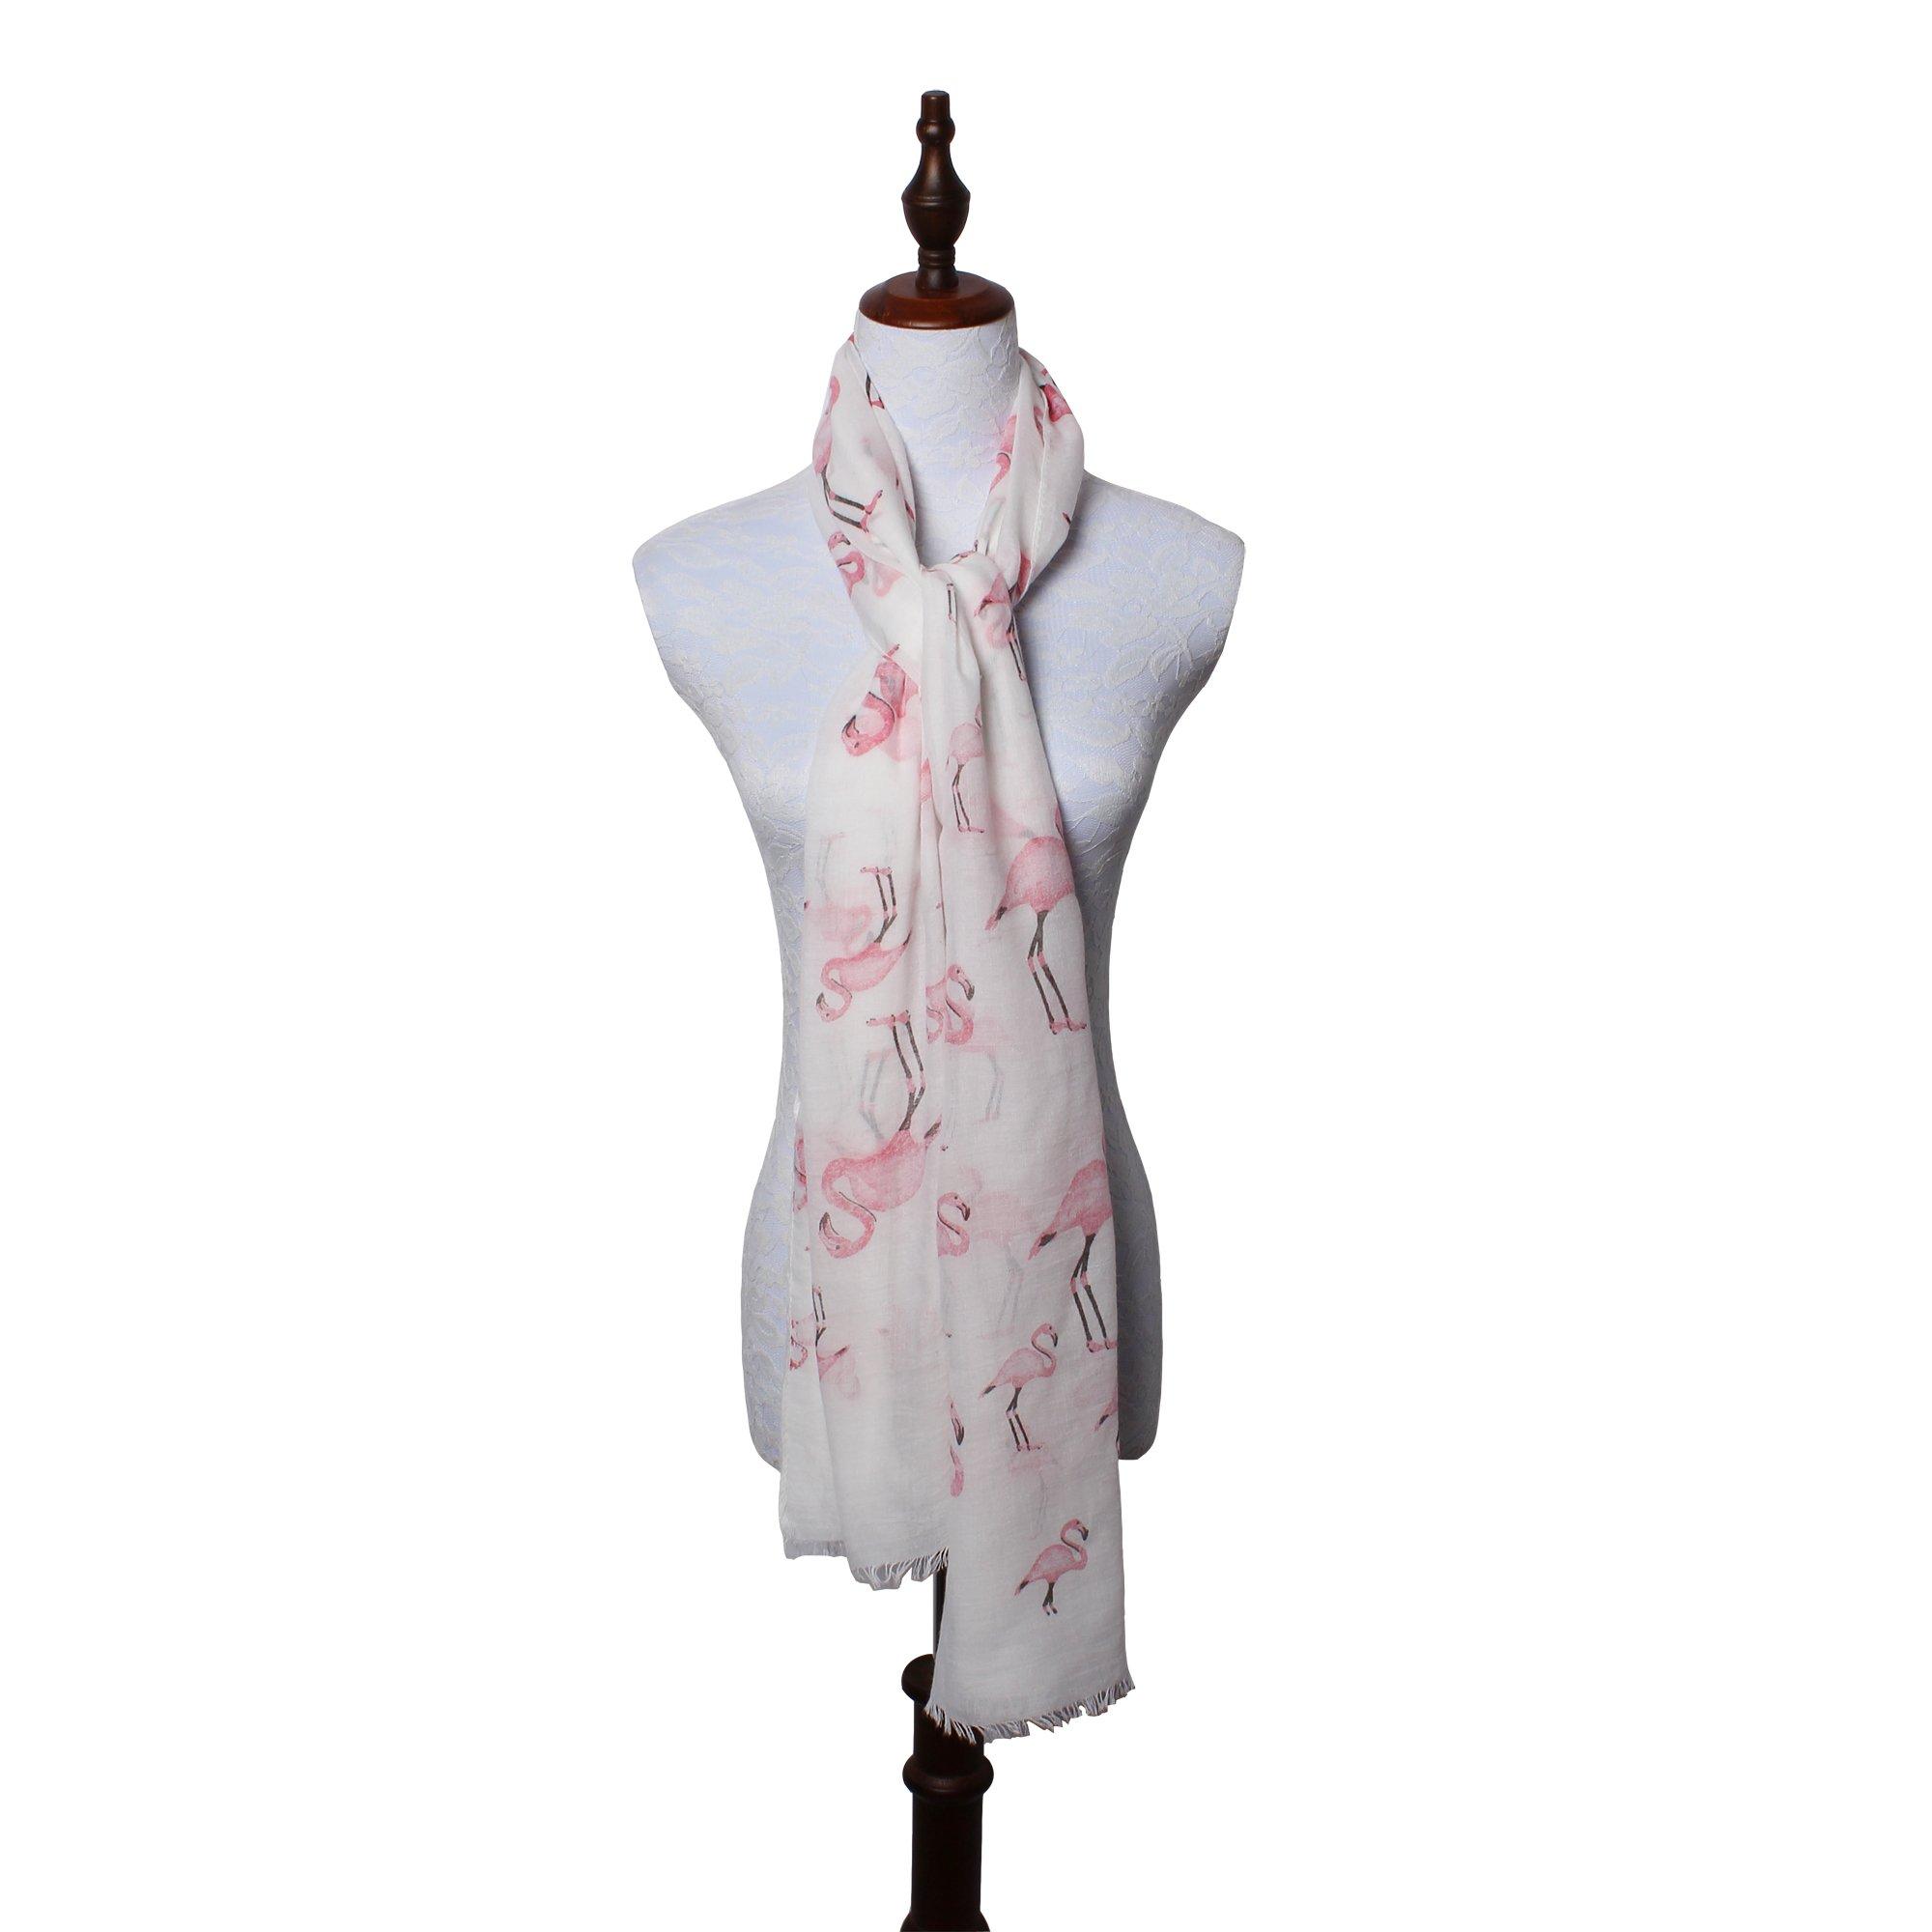 daguanjing 【Colorful Spring Inspired】 Women's Lightweight Fashion Scarf, Floral and Modern Print Sheer Shawl Wrap Flamingo by daguanjing (Image #6)